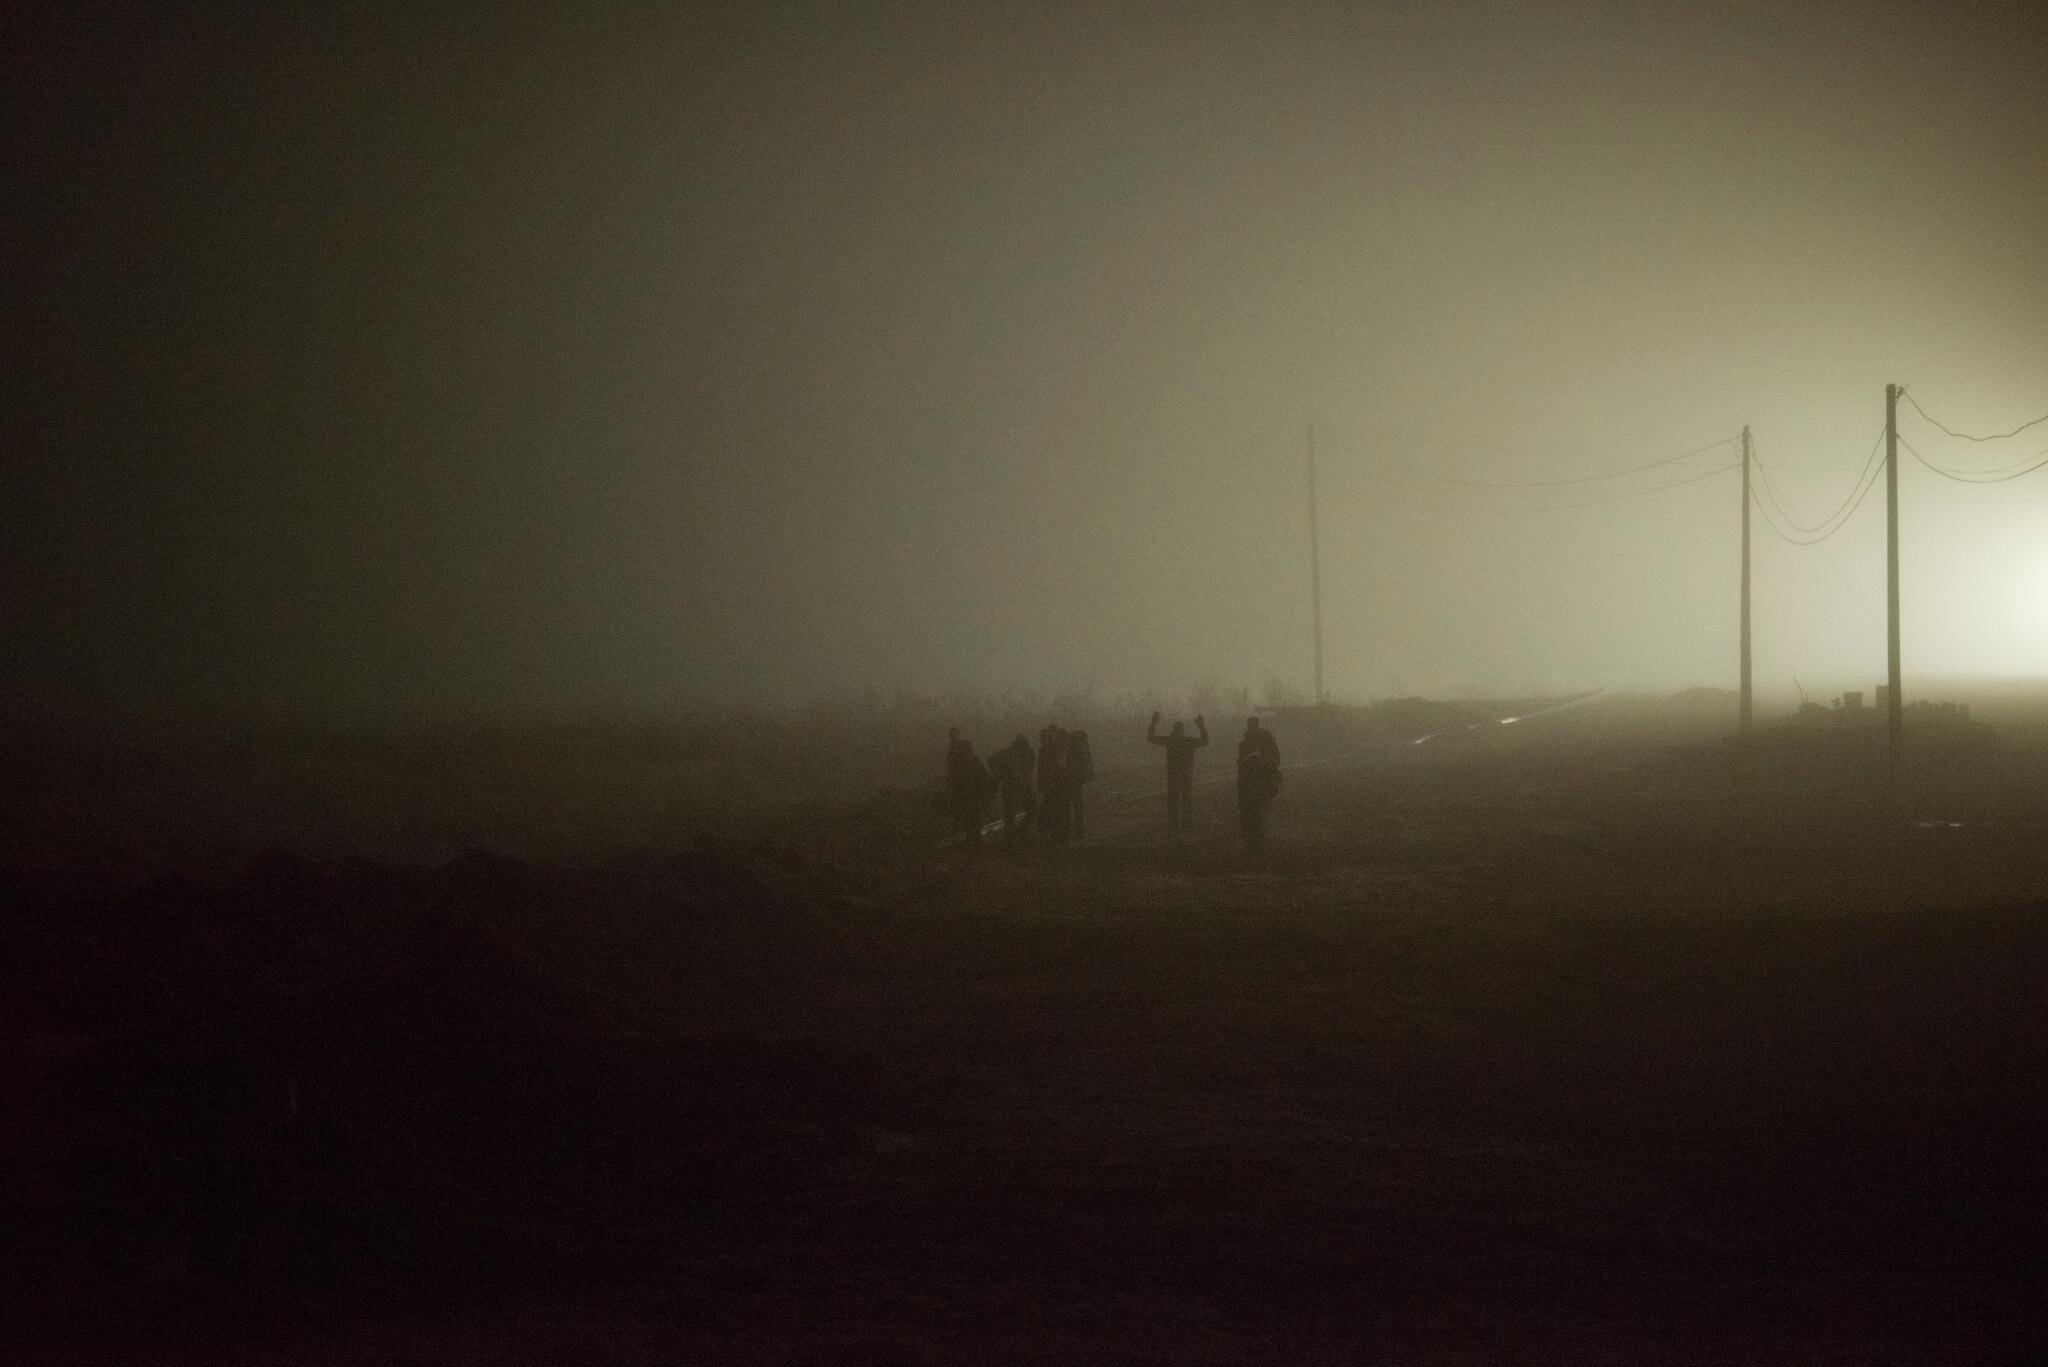 Photograph by Benoit Aquin